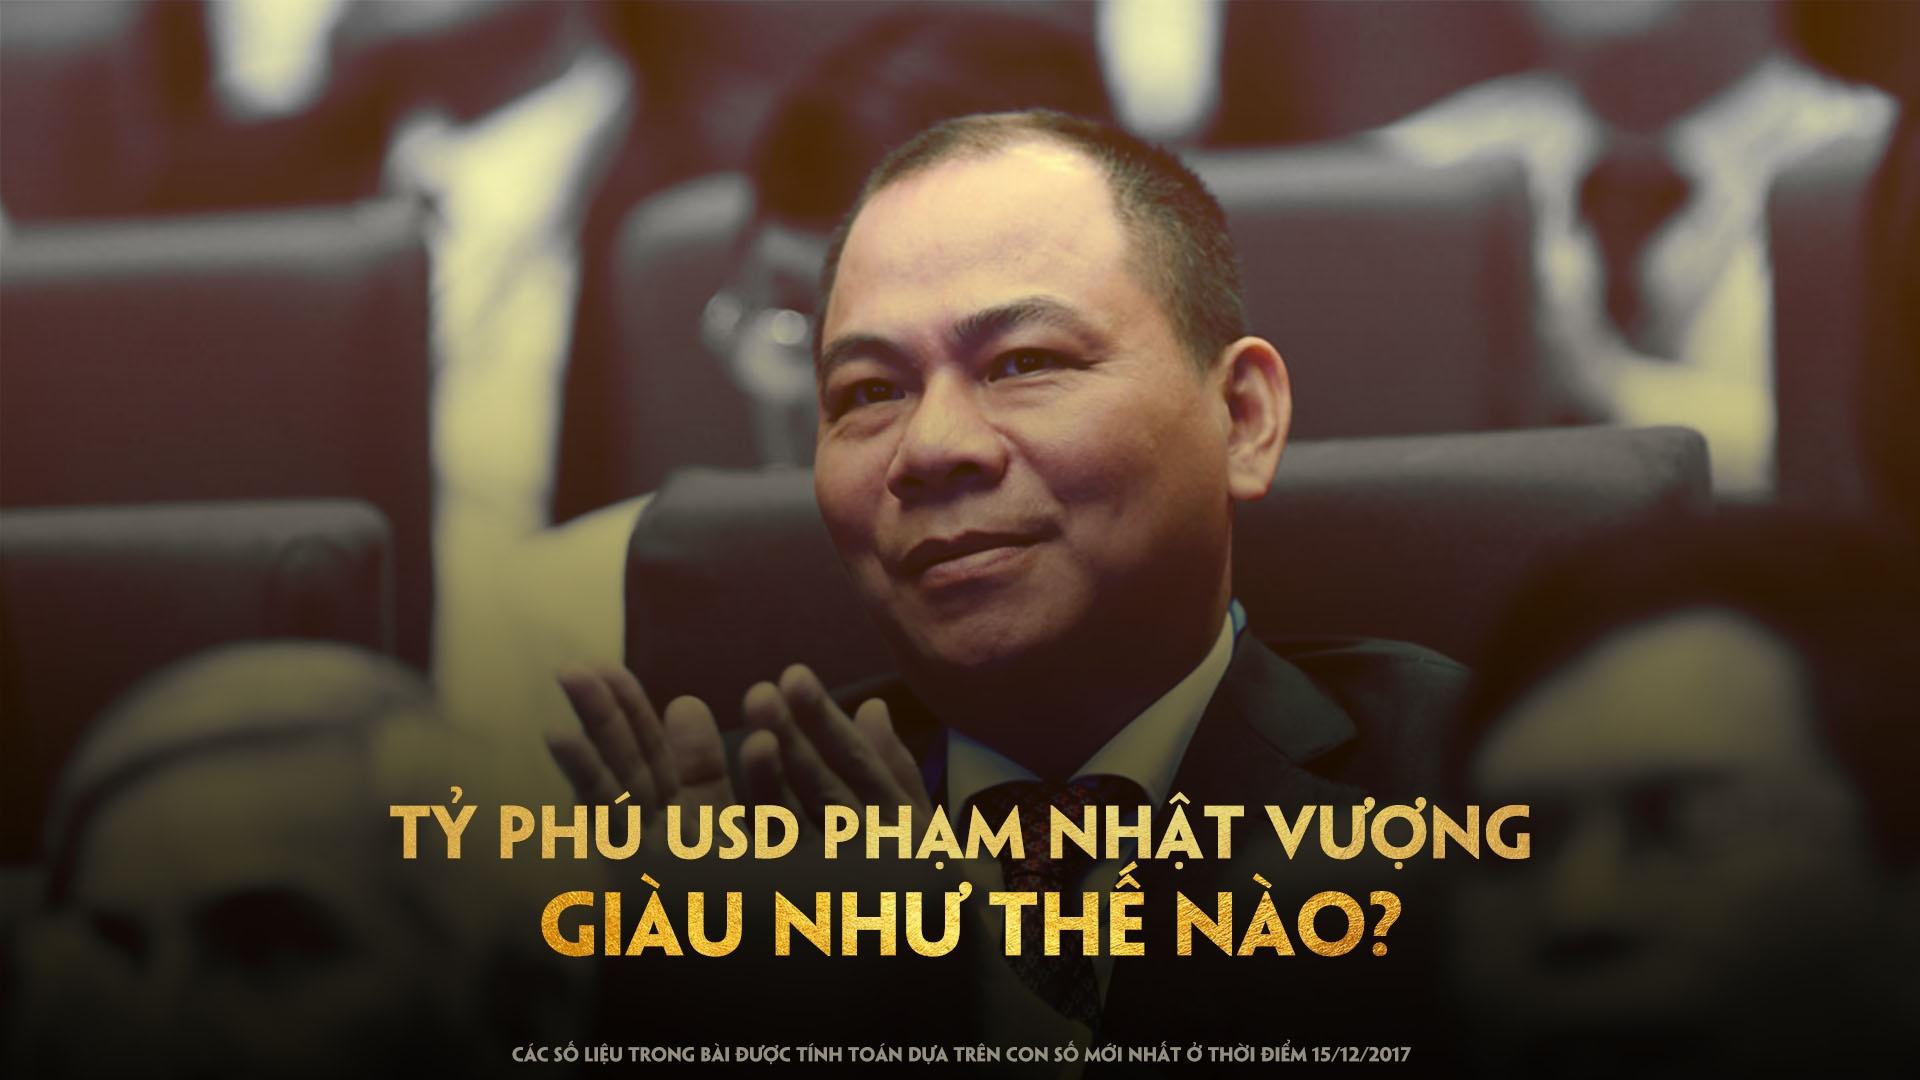 Tai san Pham Nhat Vuong anh 2